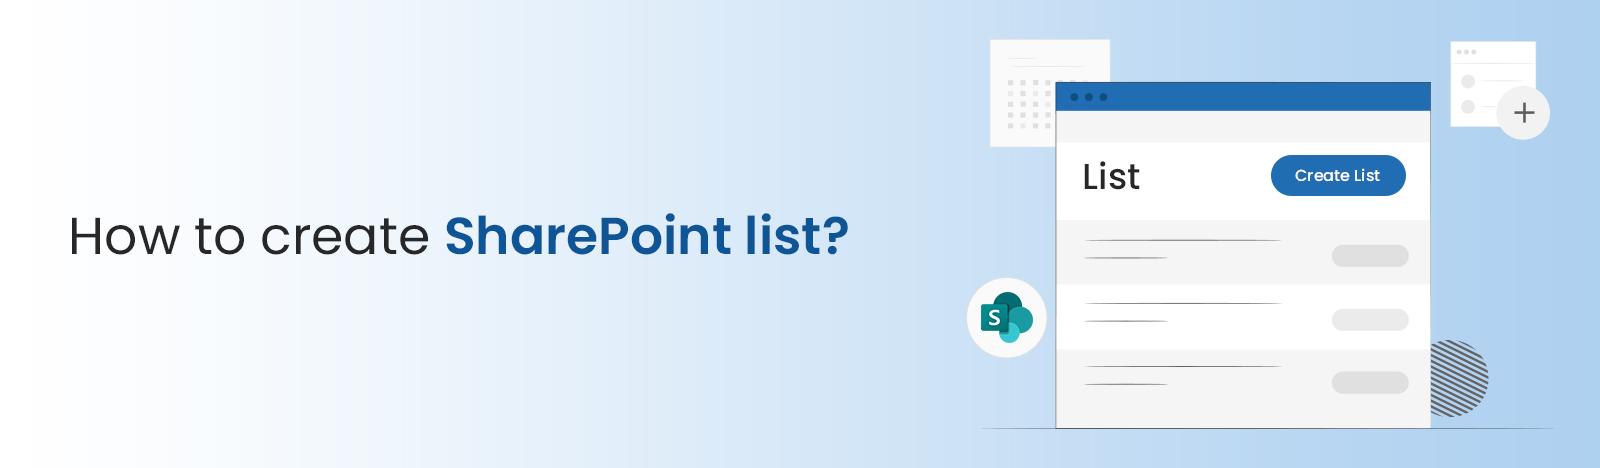 How to create SharePoint list?